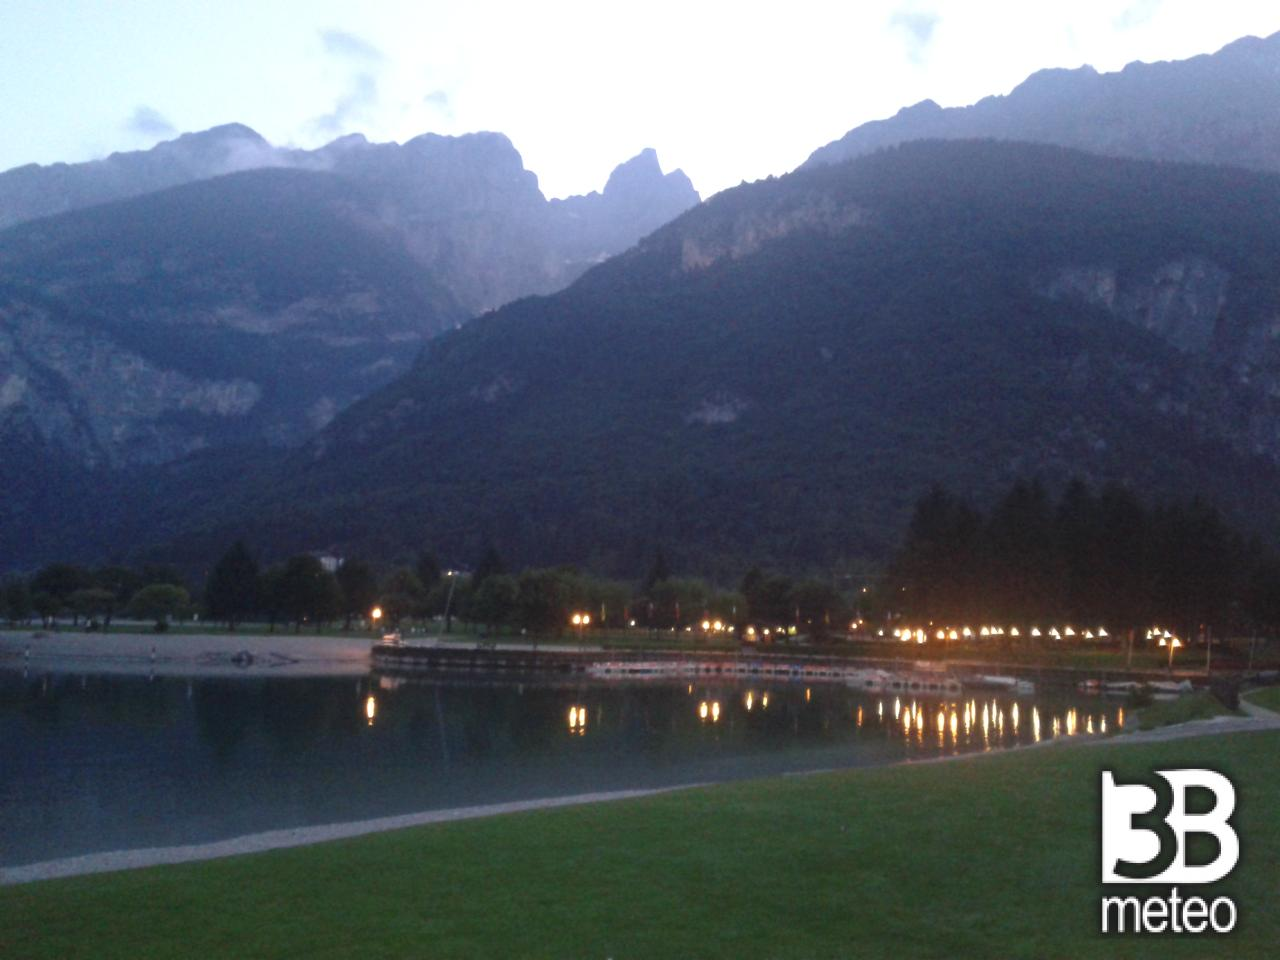 Lungo lago foto gallery 3b meteo - Lago lungo bagno di romagna ...